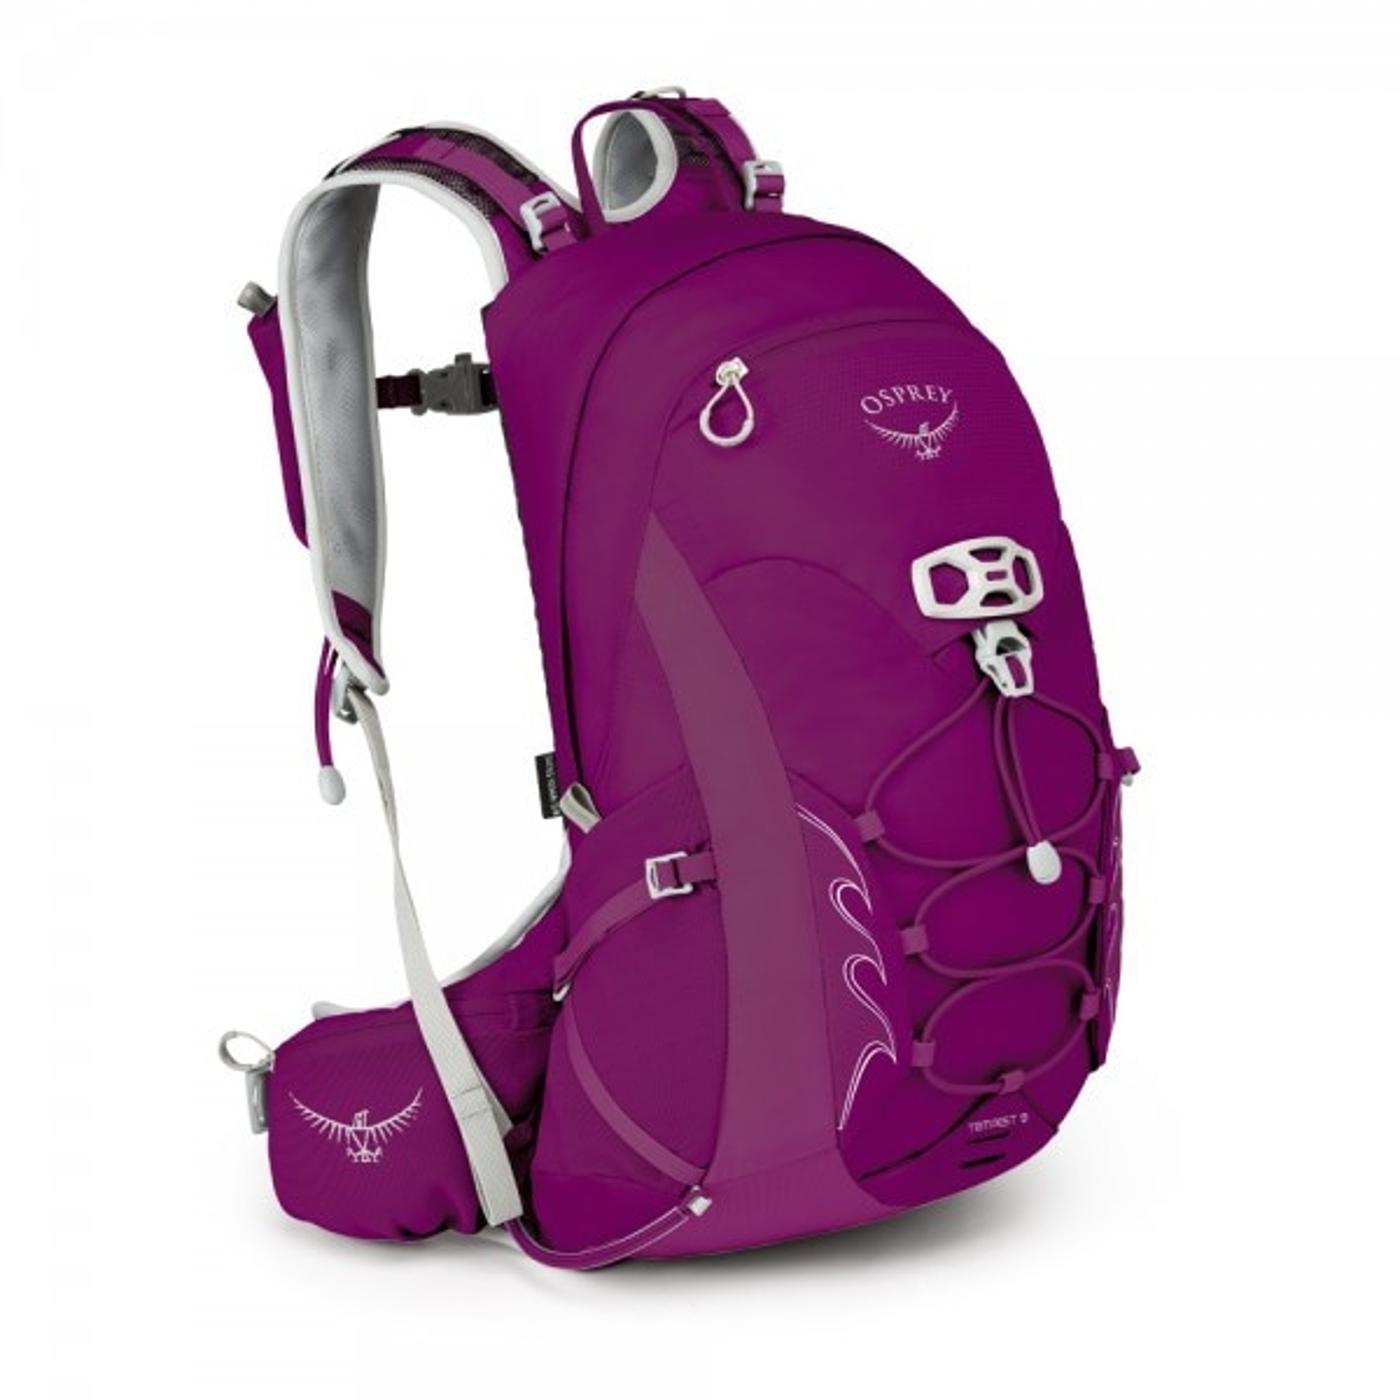 Women's backpack Osprey Tempest 9 II